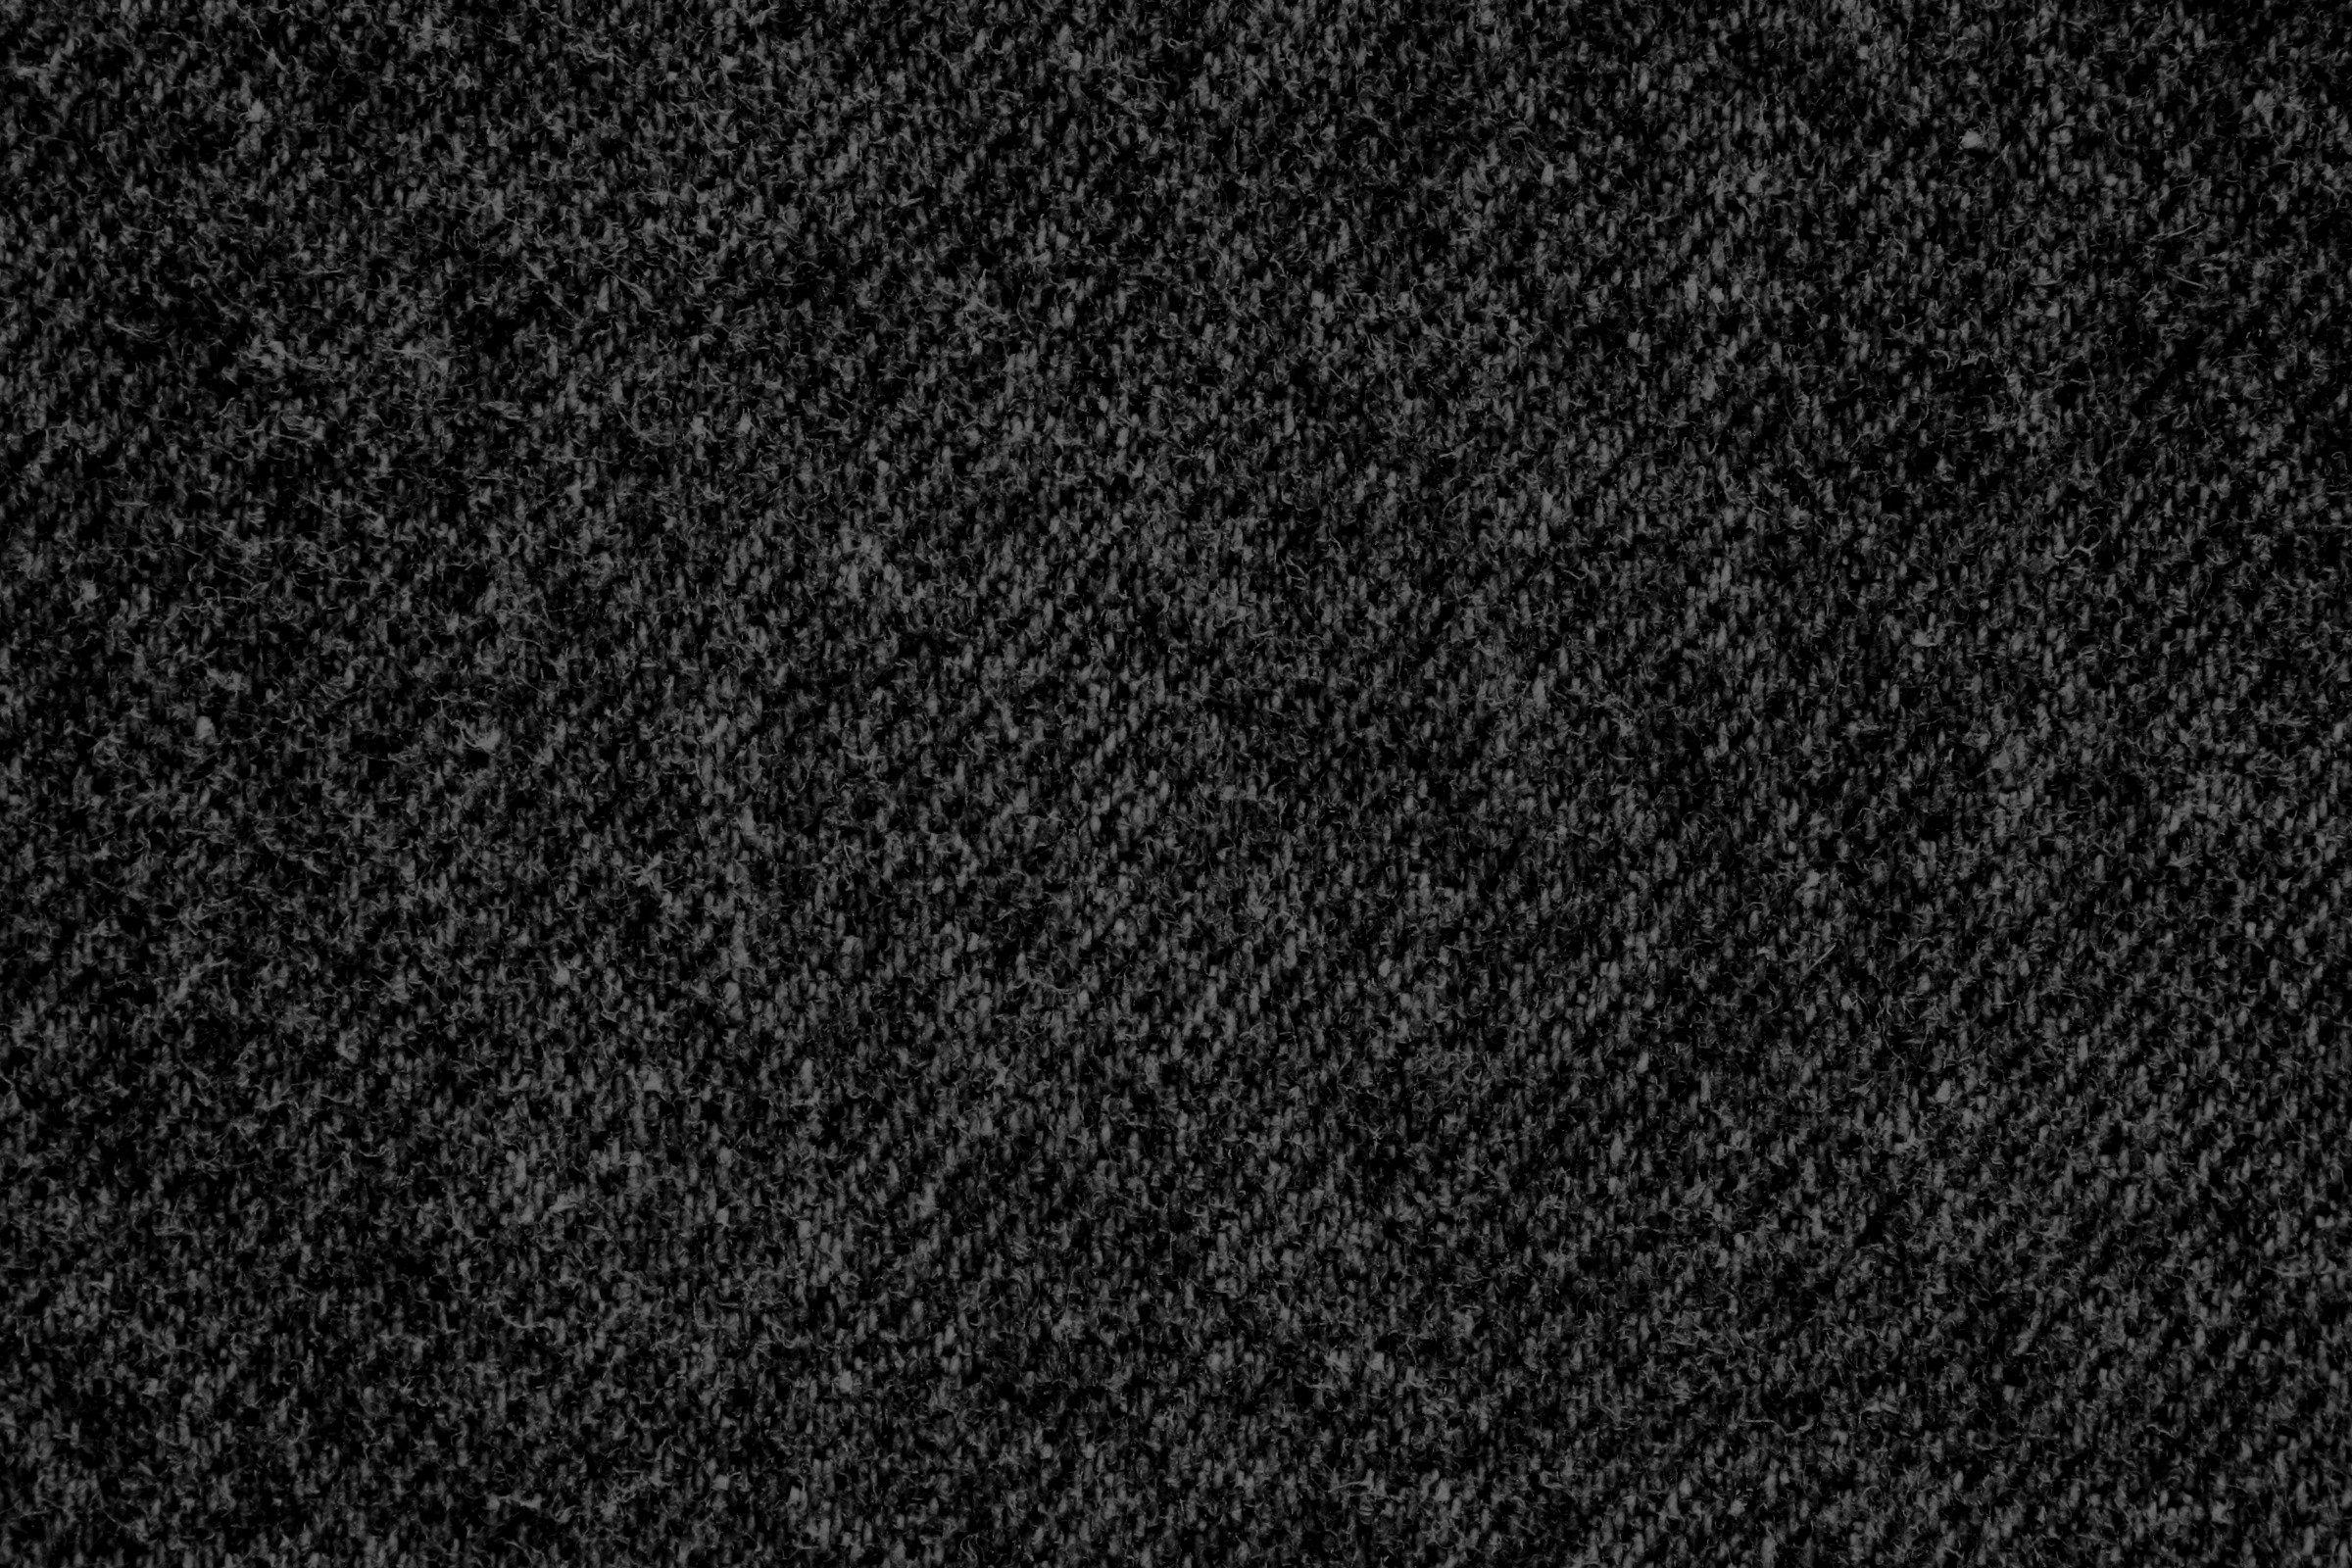 Black Denim For Jumper My Dream Liberty Jane Outfit 1 Pinterest Denim Fabric